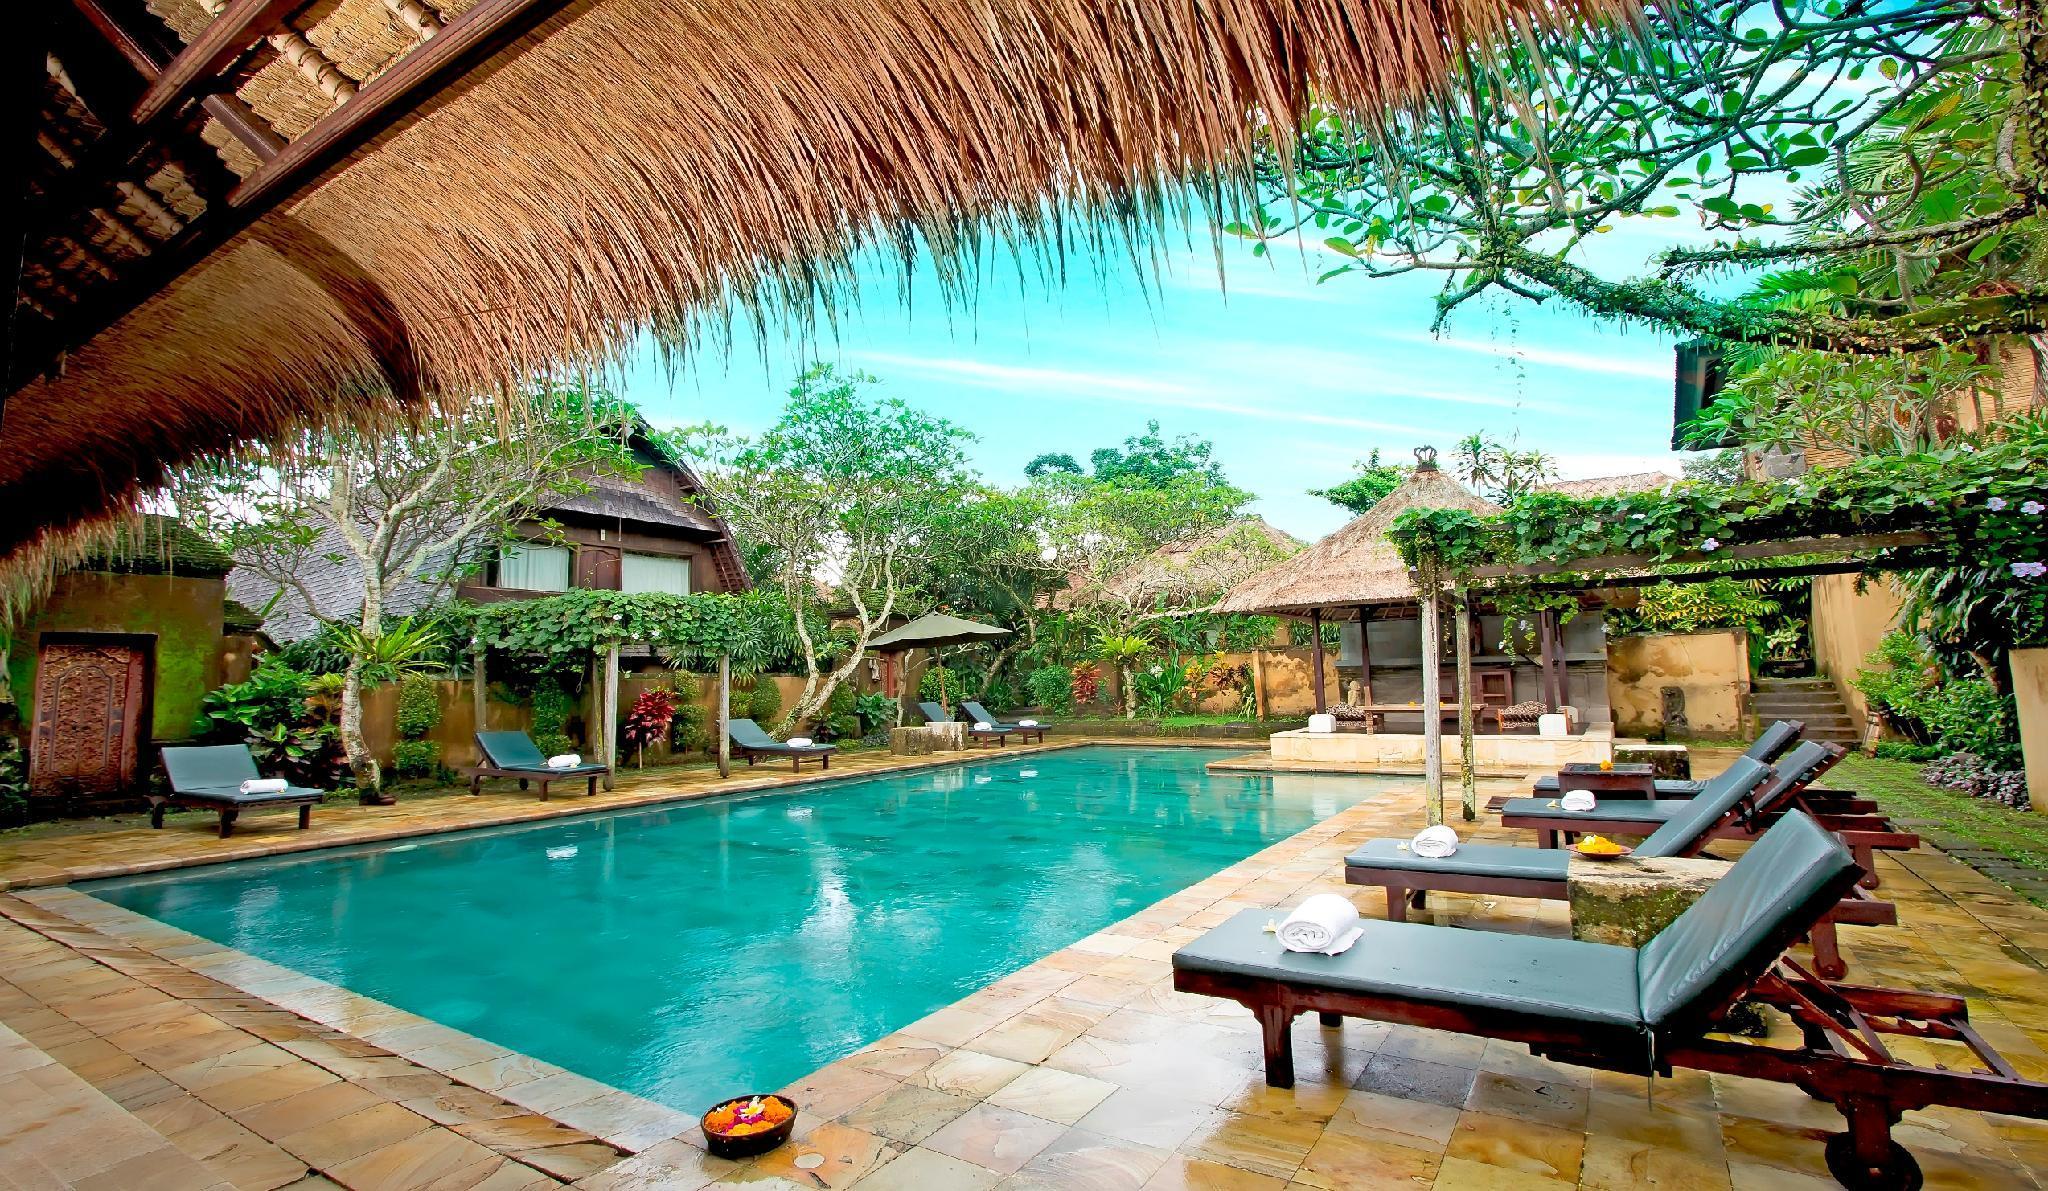 The Sungu Resort And Spa